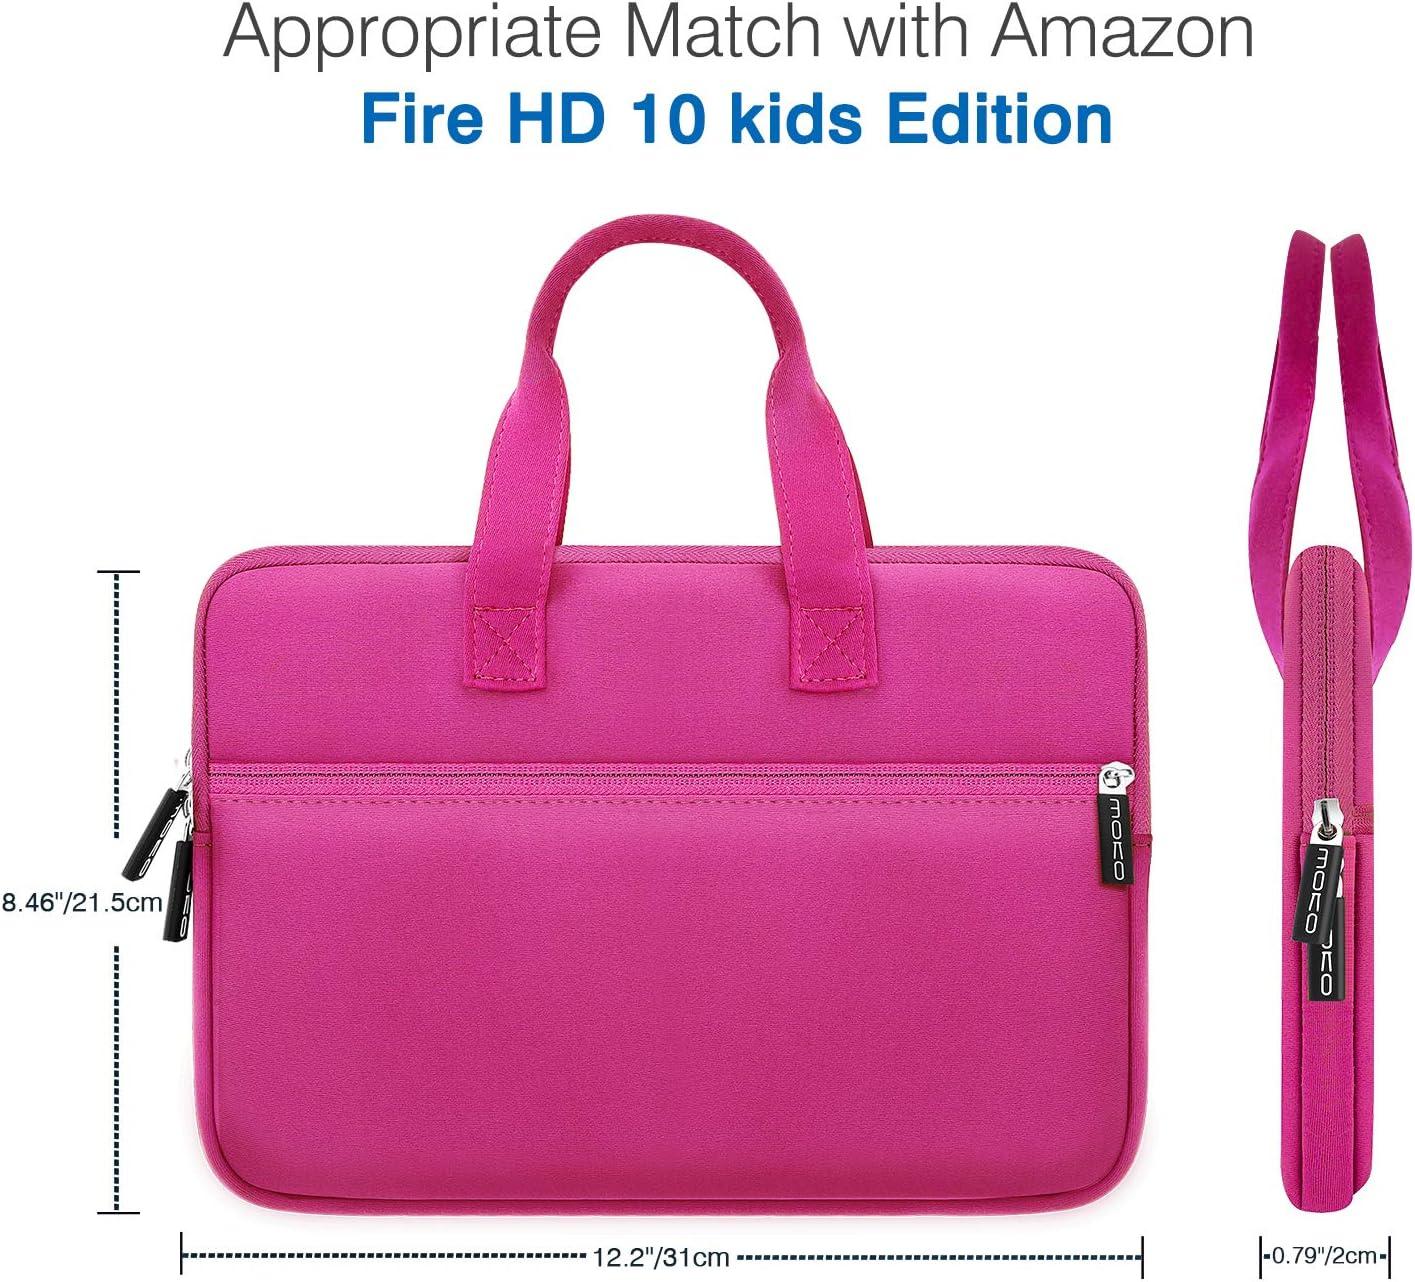 iPad Air 3 10.5 Magenta Portable Neoprene Zipper Carrying Sleeve Case Bag Fits iPad 10.2 2019 MoKo 9-10.5 Inch Kids Tablet Sleeve iPad Pro 11//10.5 Inch Tablet Handle Bag with Accessory Pocket